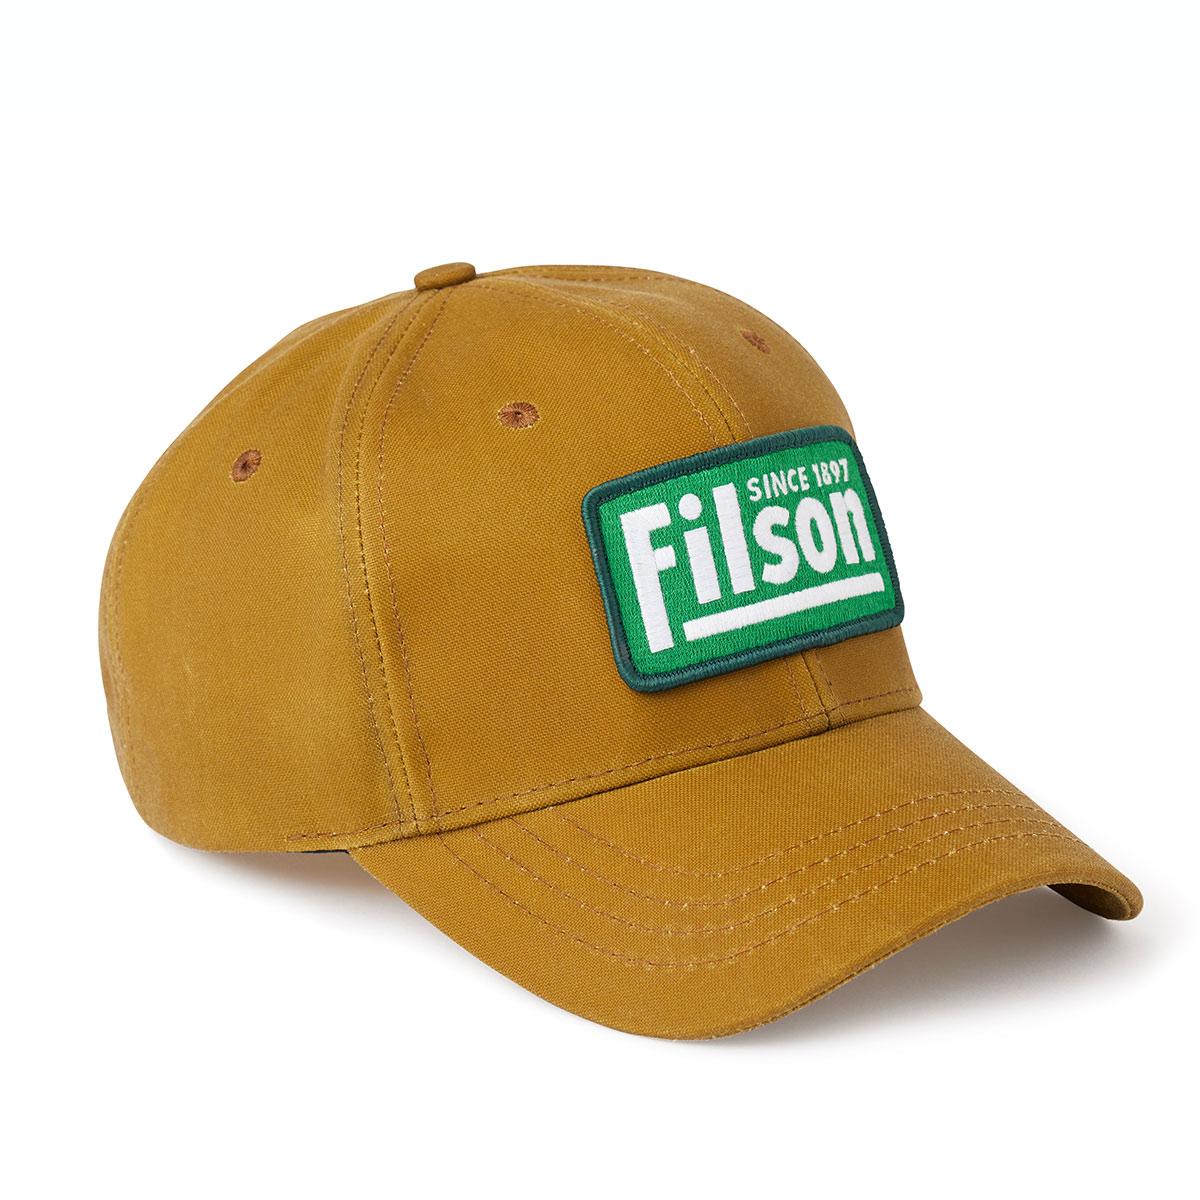 Filson Oil Tin Logger Cap 20180529 Tan